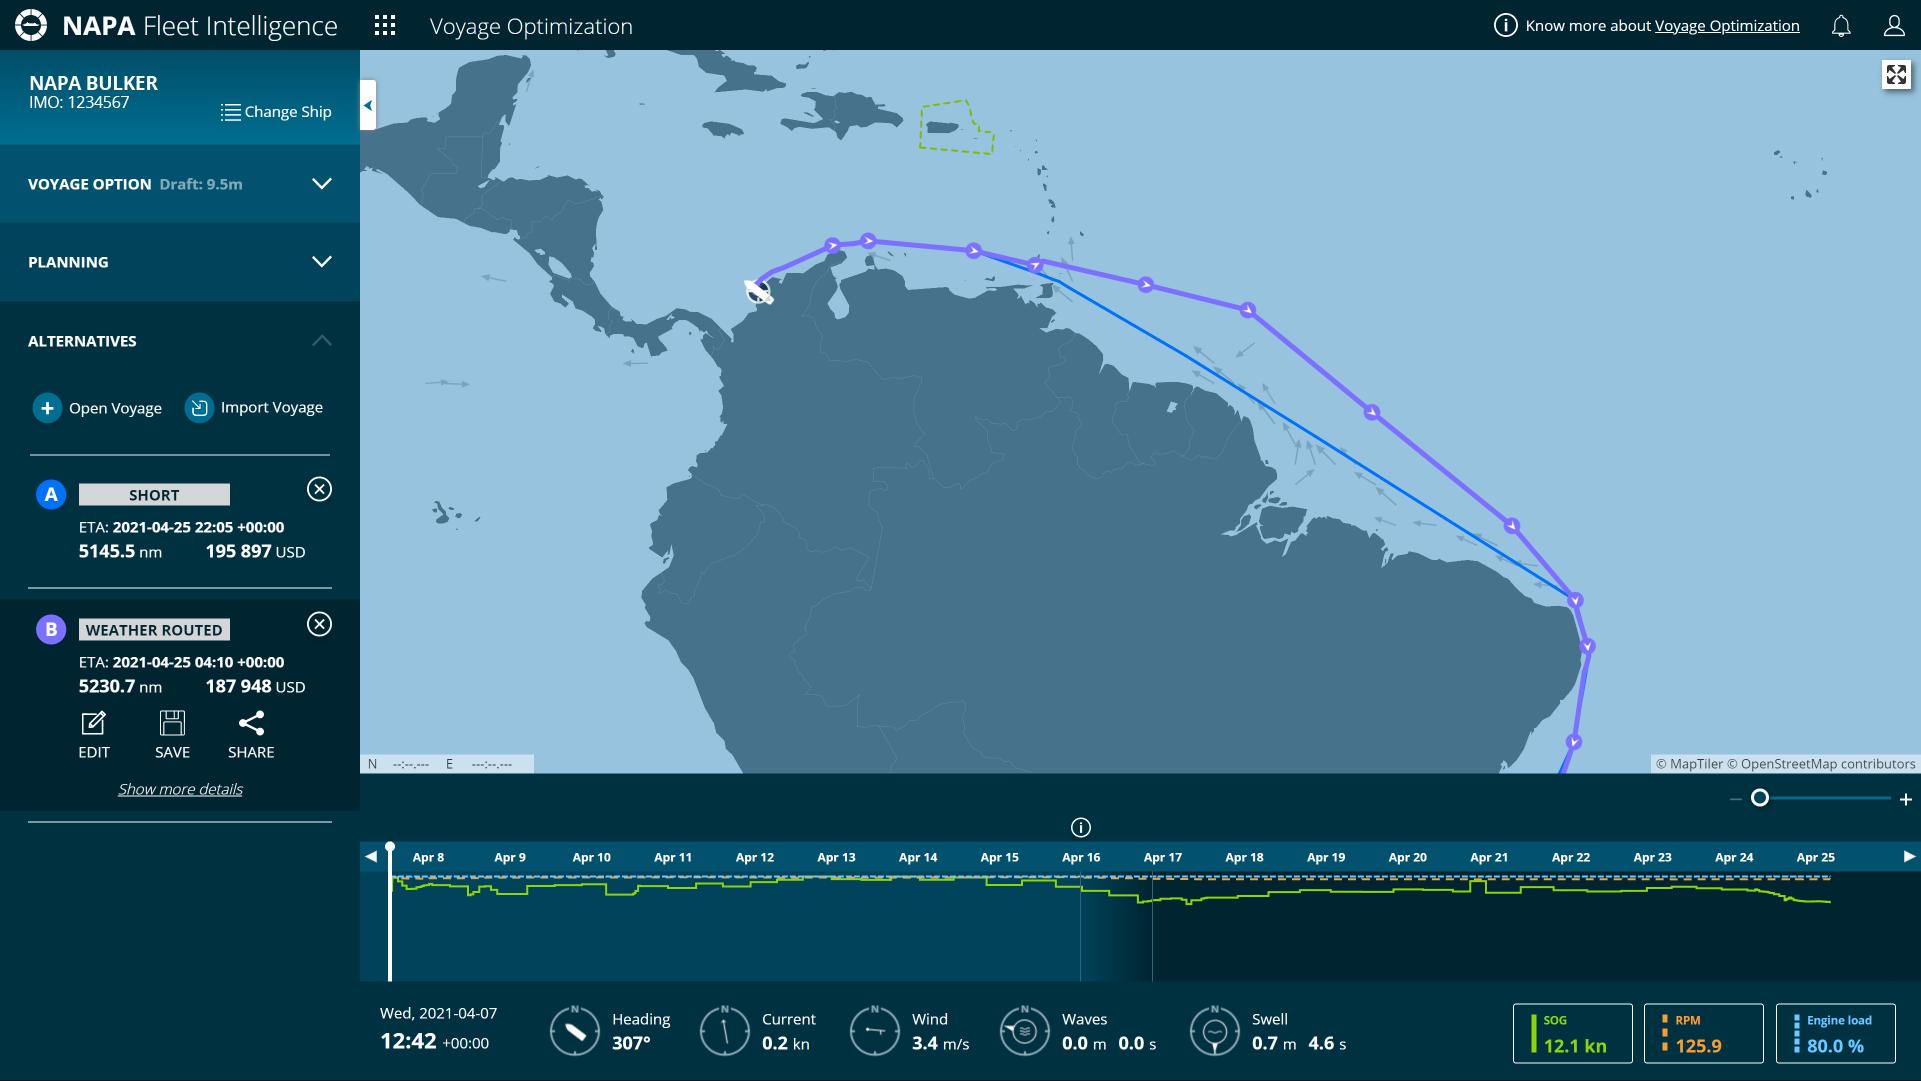 NAPA Voyage Optimization North of Brazil